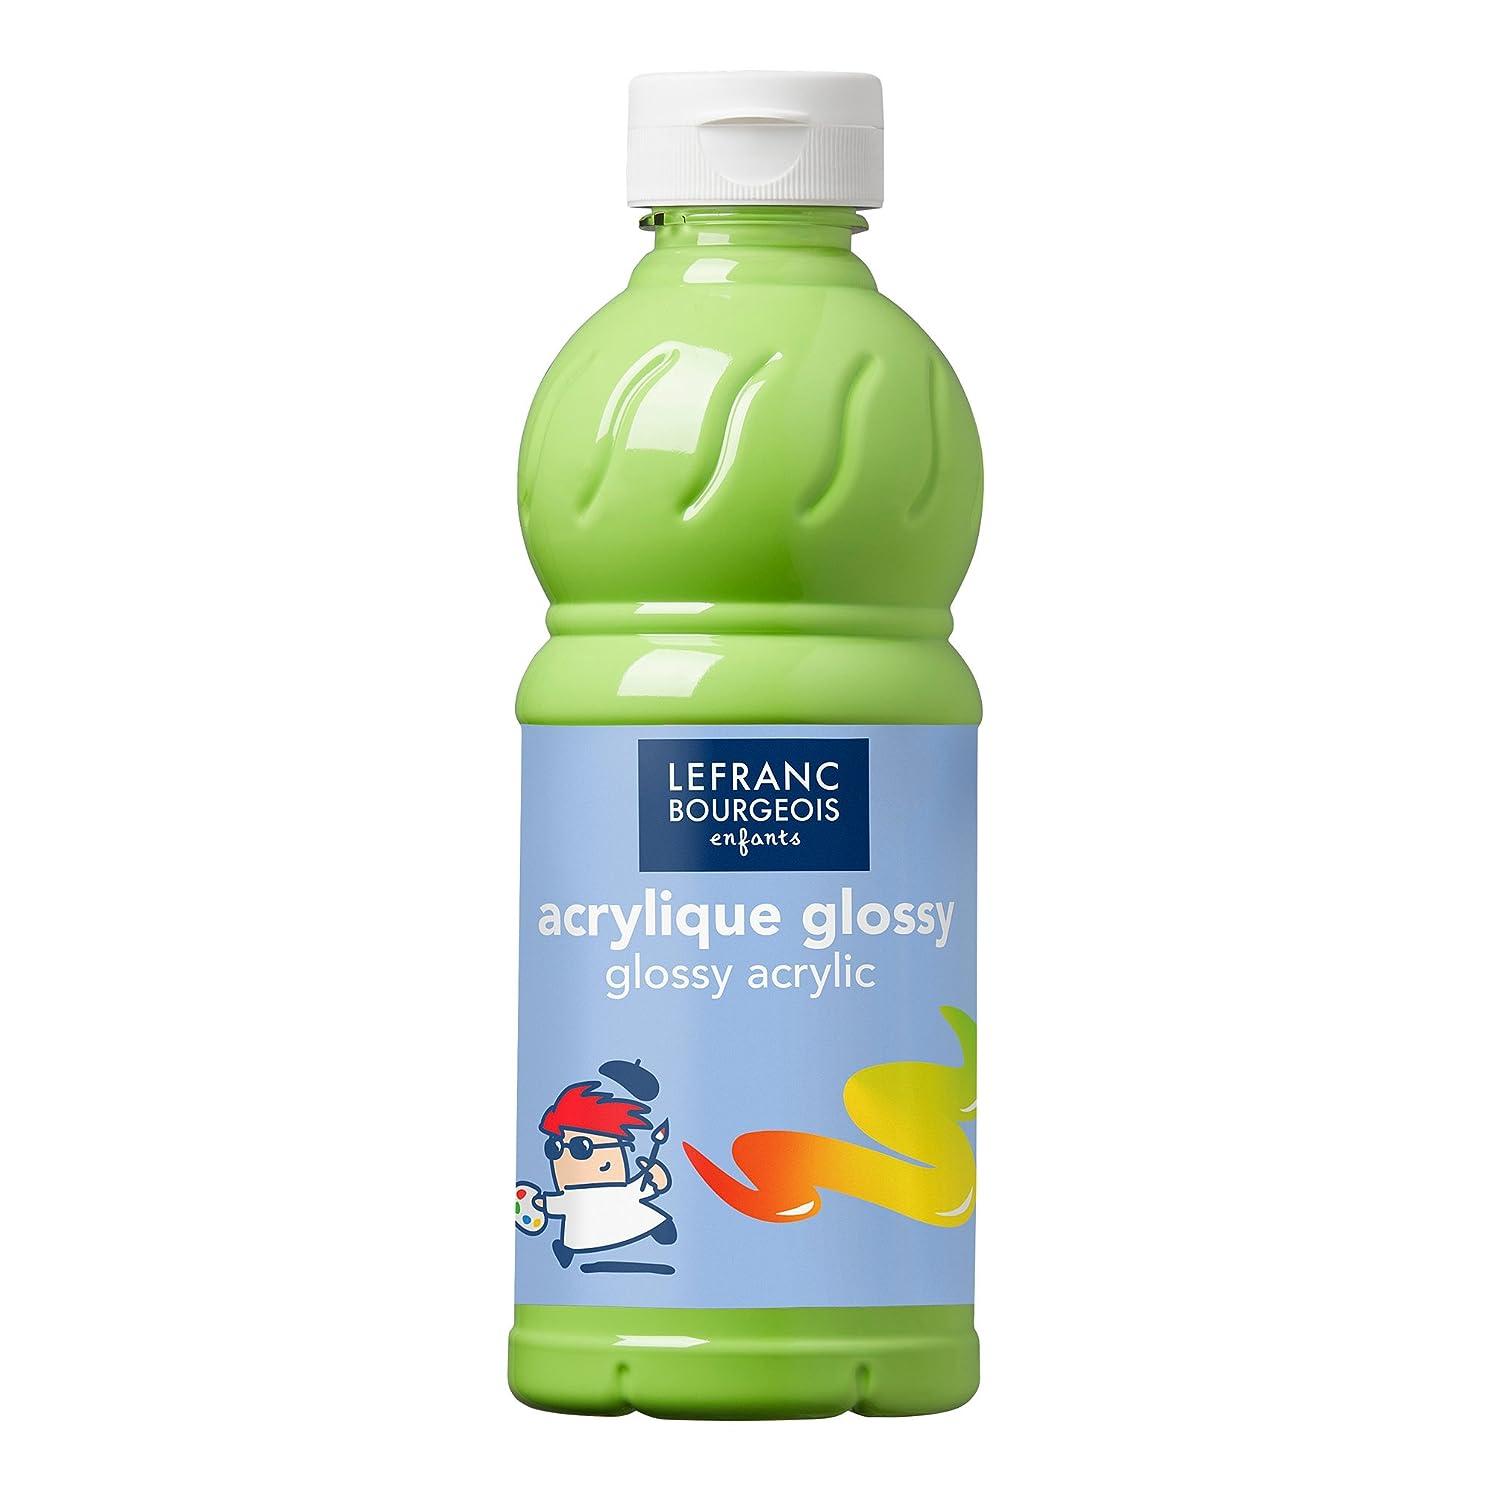 Lefranc & Bourgeois Glossy Children Acrylic 250?ml Tube, Acrylic Paint, Lime Green, Kinder - Acrylfarbe - 500ml Flasche